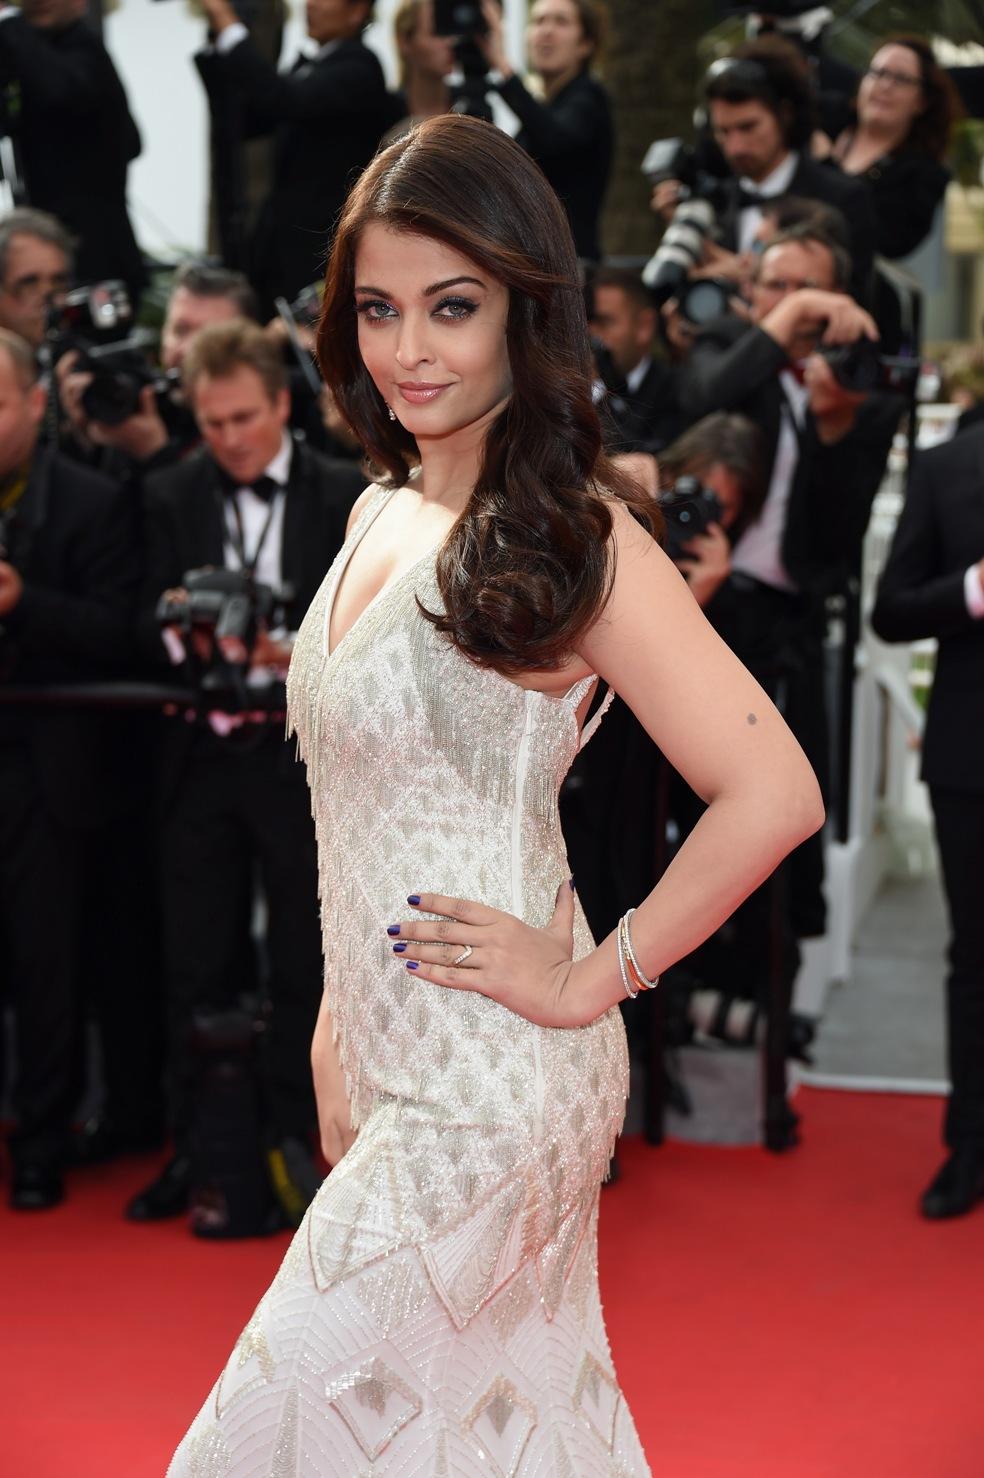 Aishwarya Rai Makes Dazzling Appearance in Gold at Cannes ... |Aishwarya Rai 2014 March